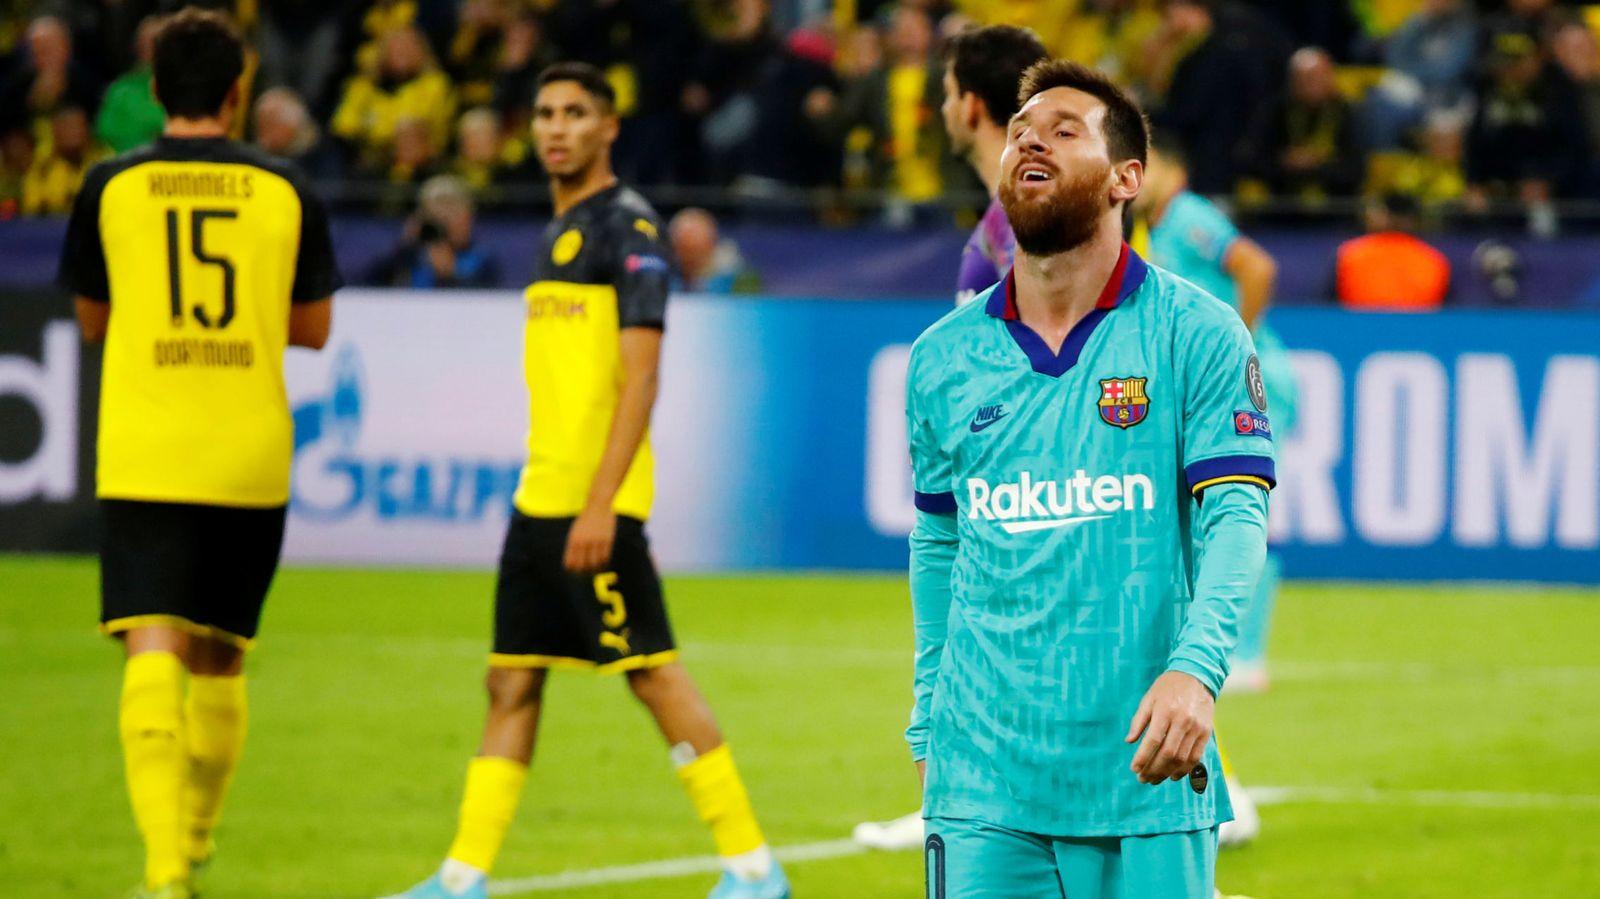 Foto: Champions league - group f - borussia dortmund v fc barcelona